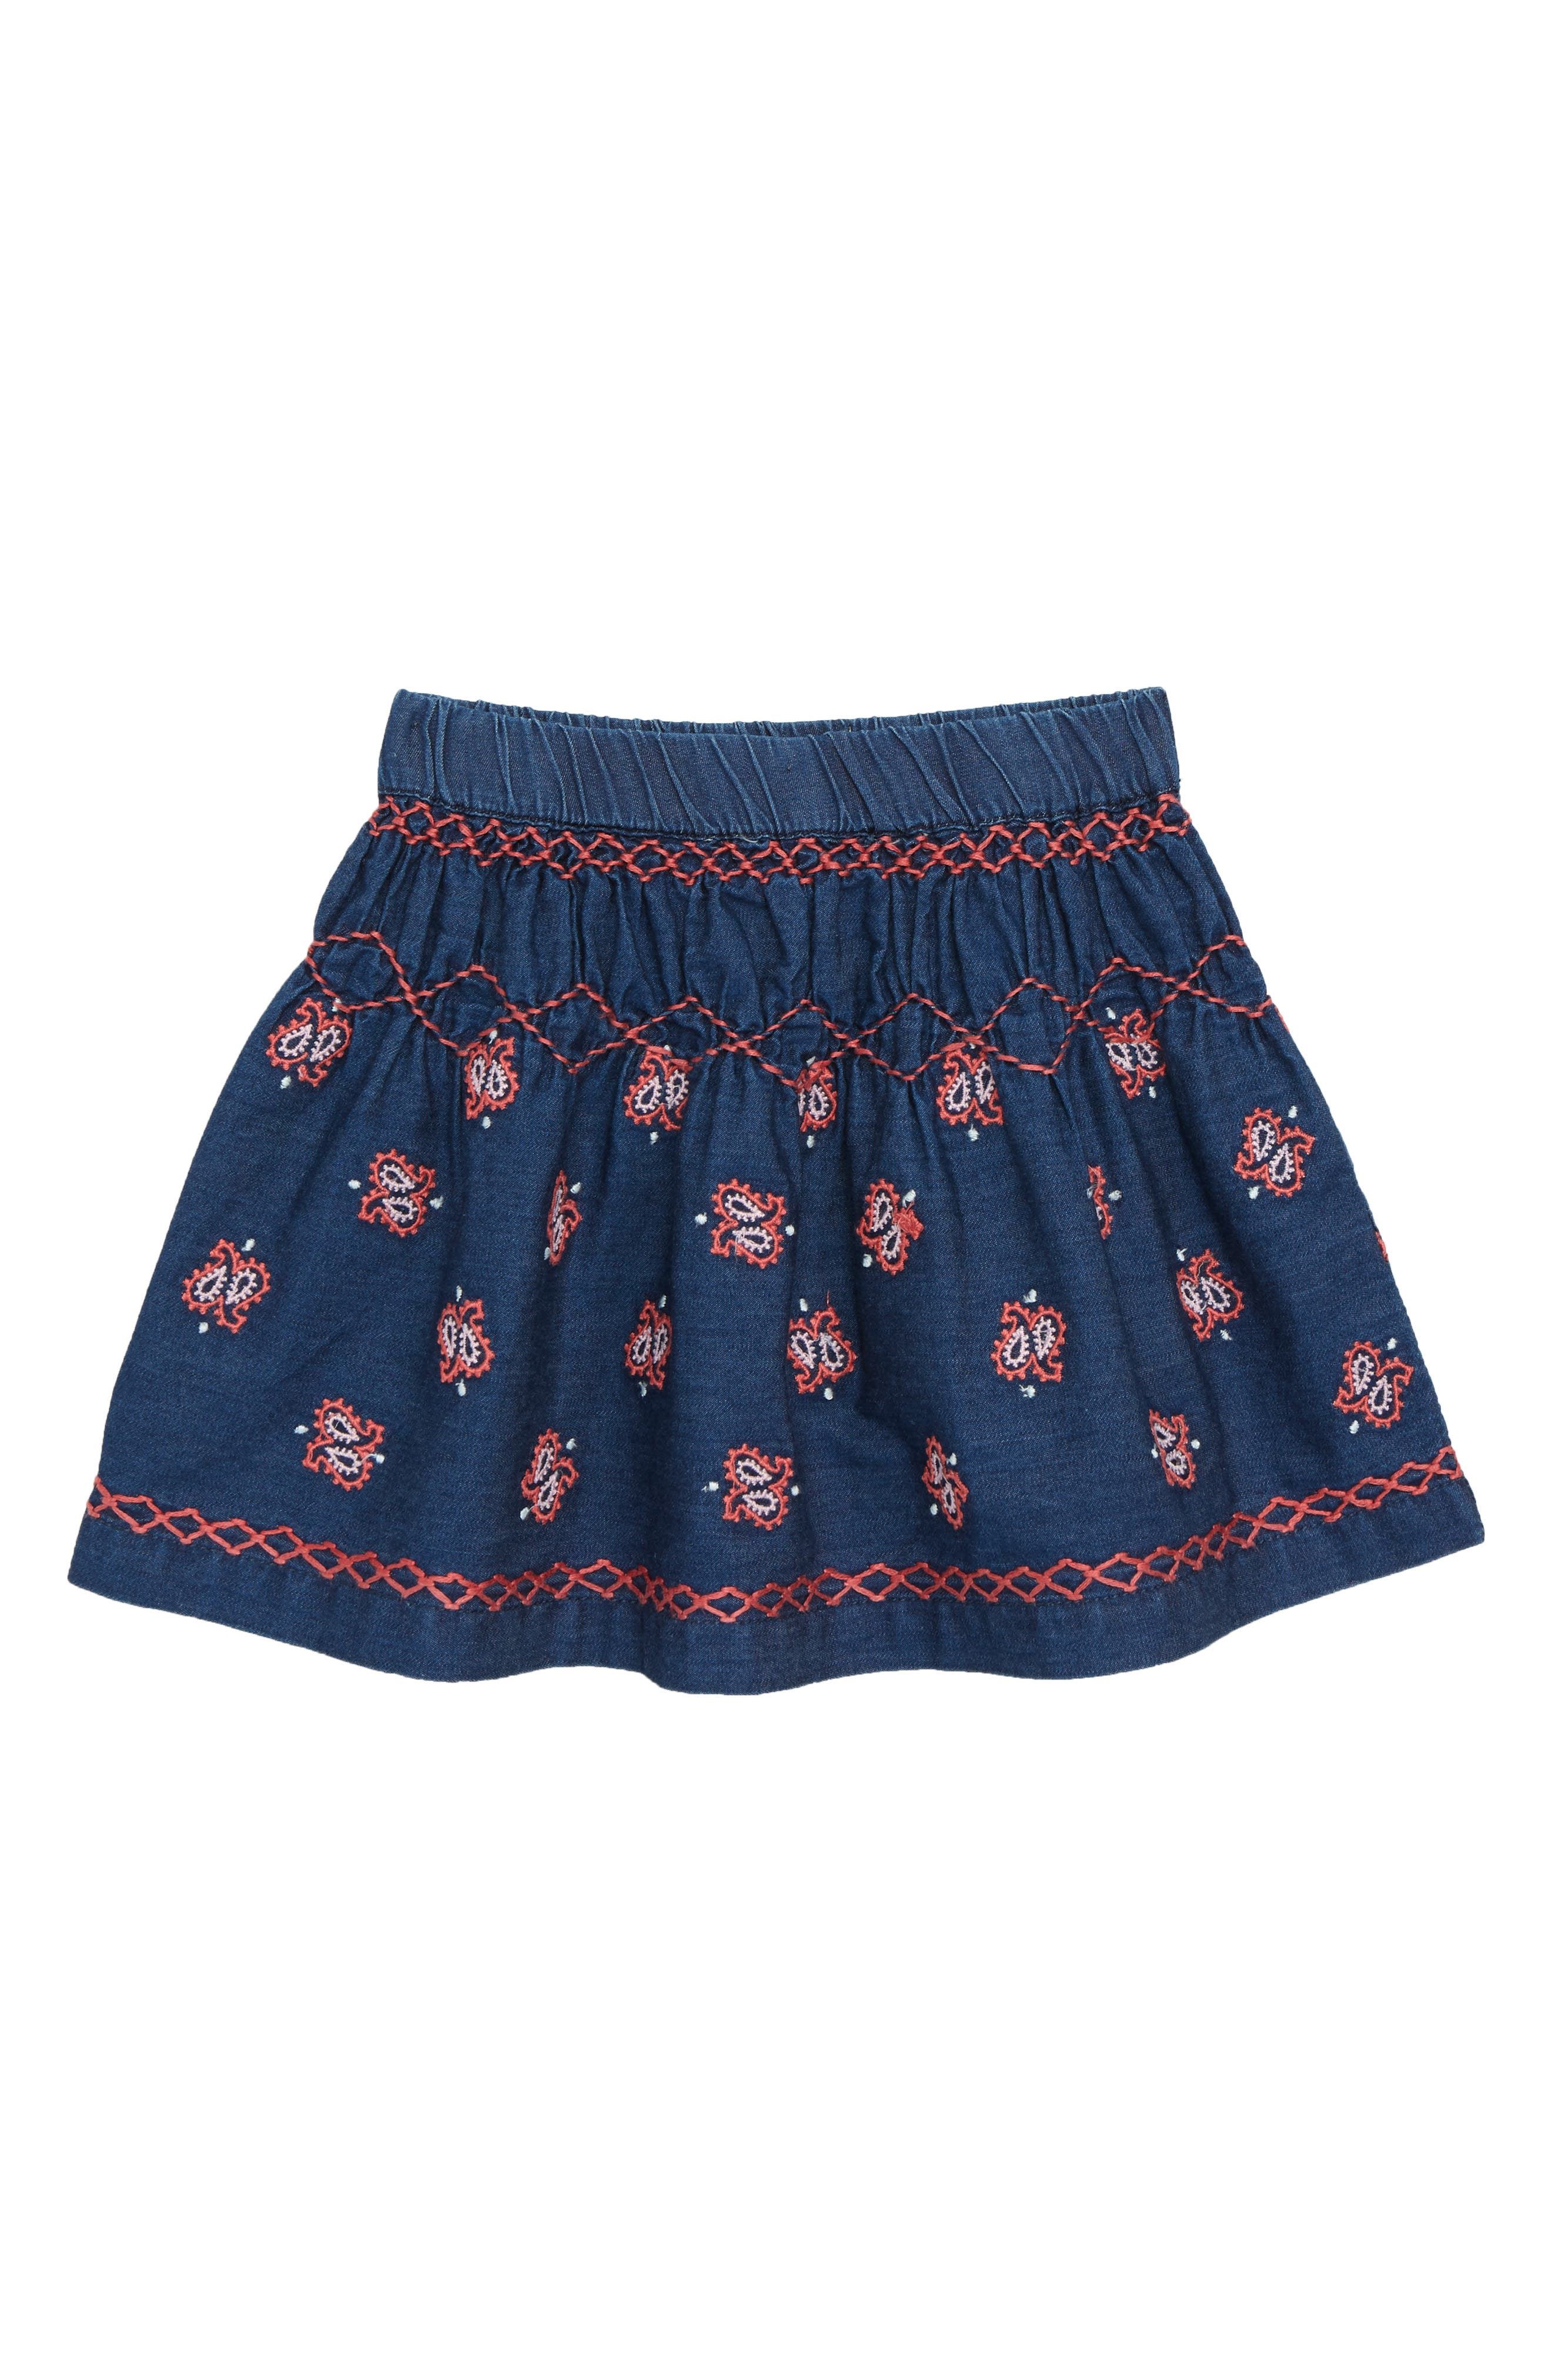 Grace Embroidered Denim Skirt,                         Main,                         color, Indigo